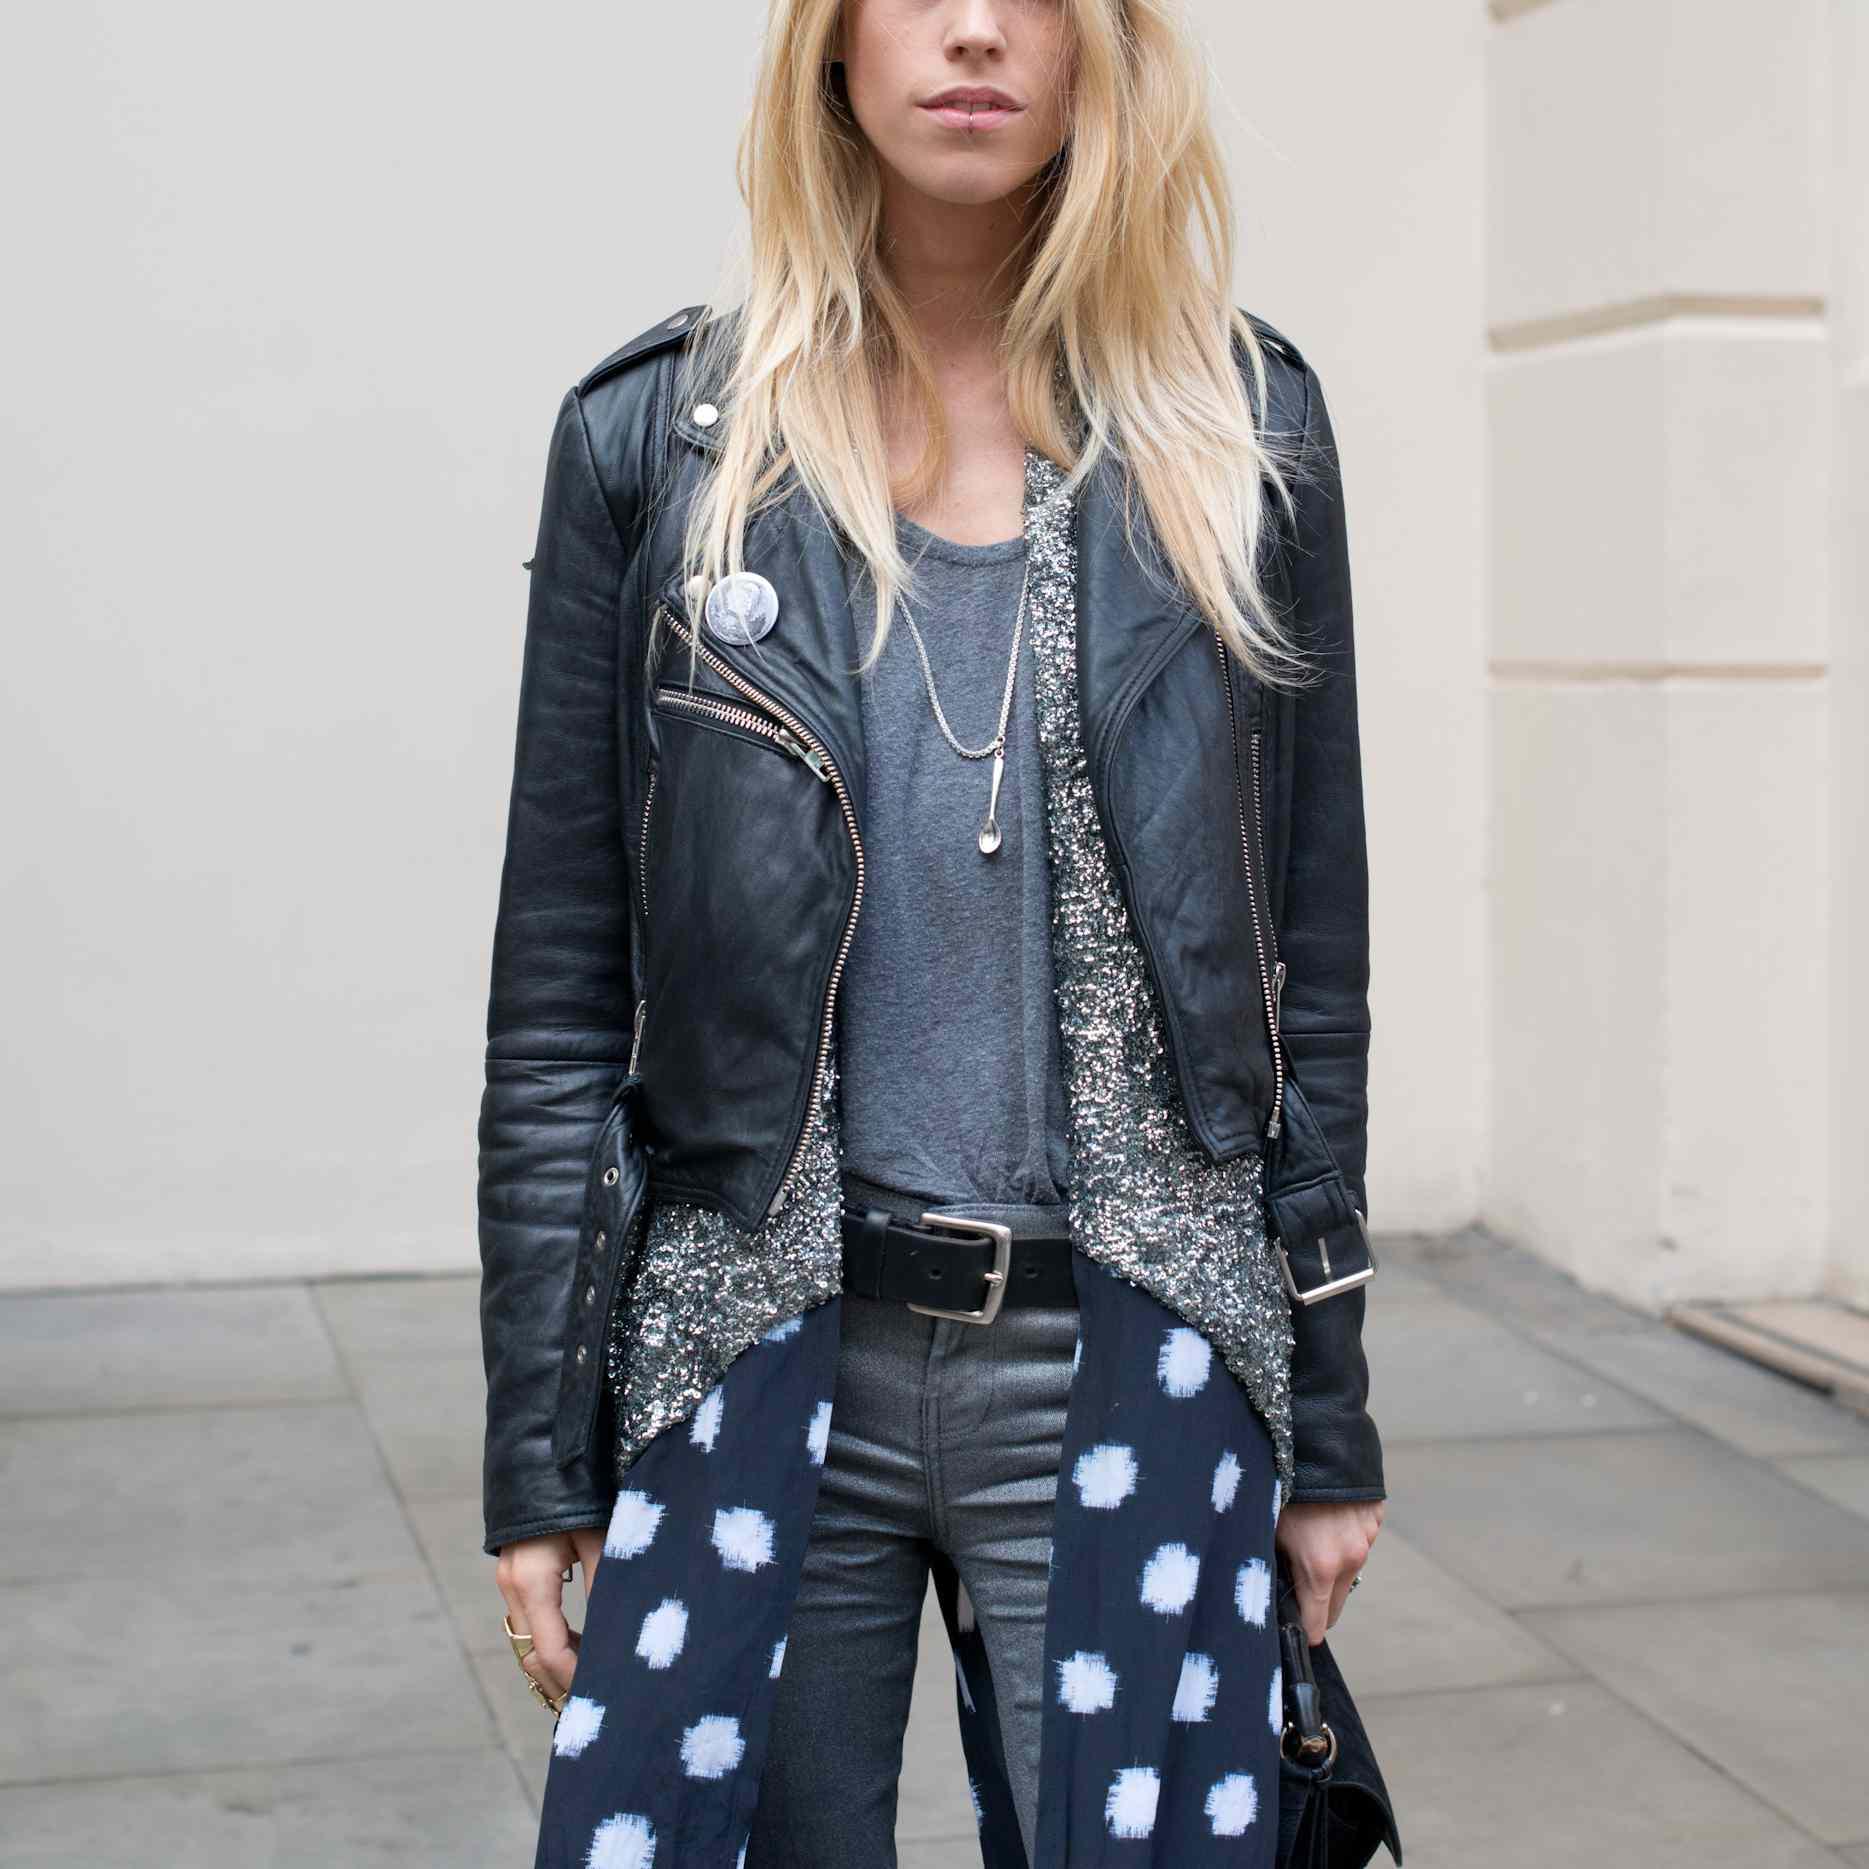 DJ-Lady-Mary-Charteris-J-Crew-jeans-Kirstin-Sinclair.jpg